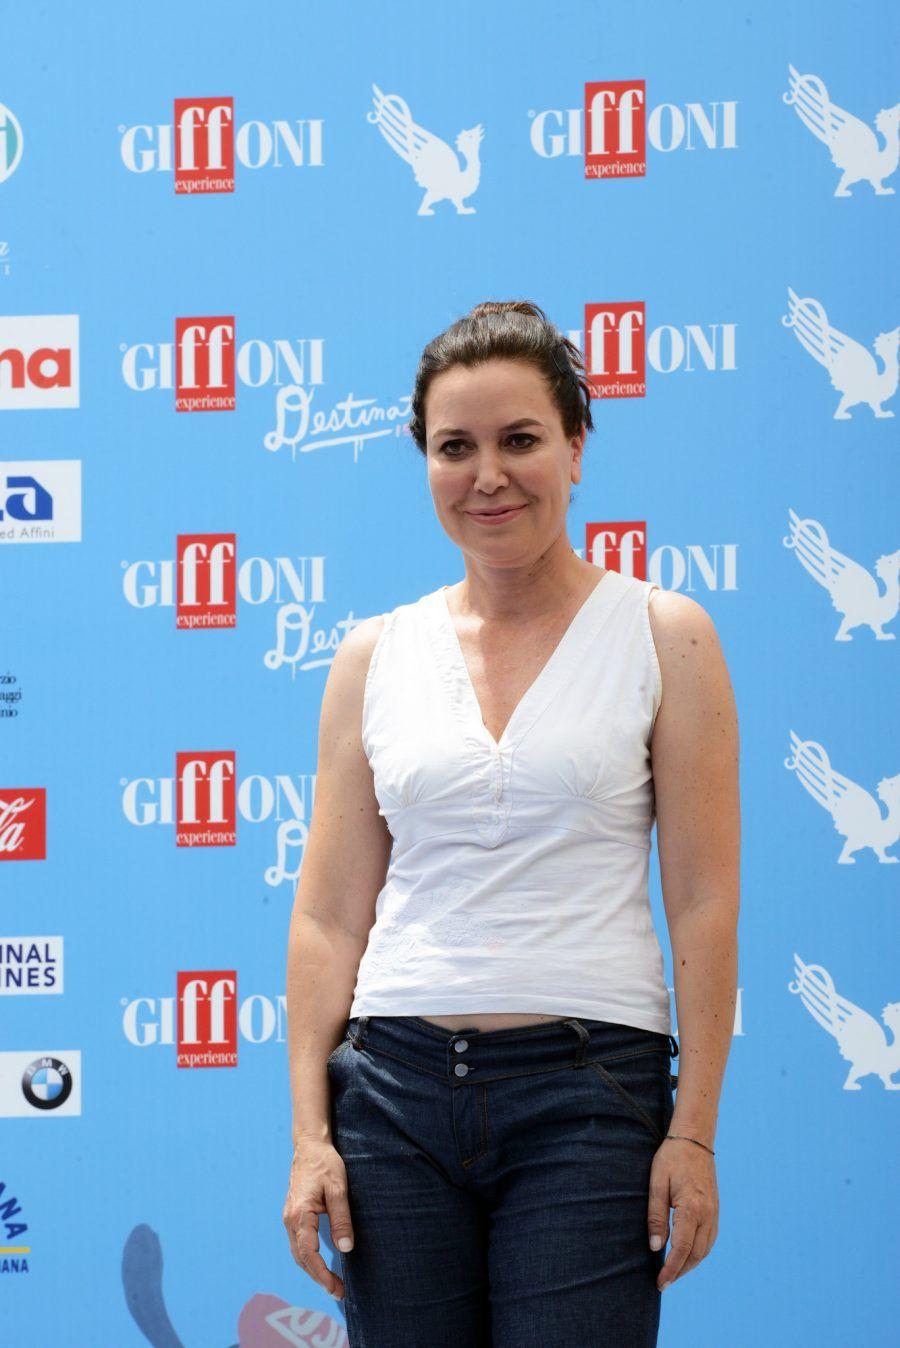 Sabina Guzzanti ospite al Giffoni Film Festival 2016